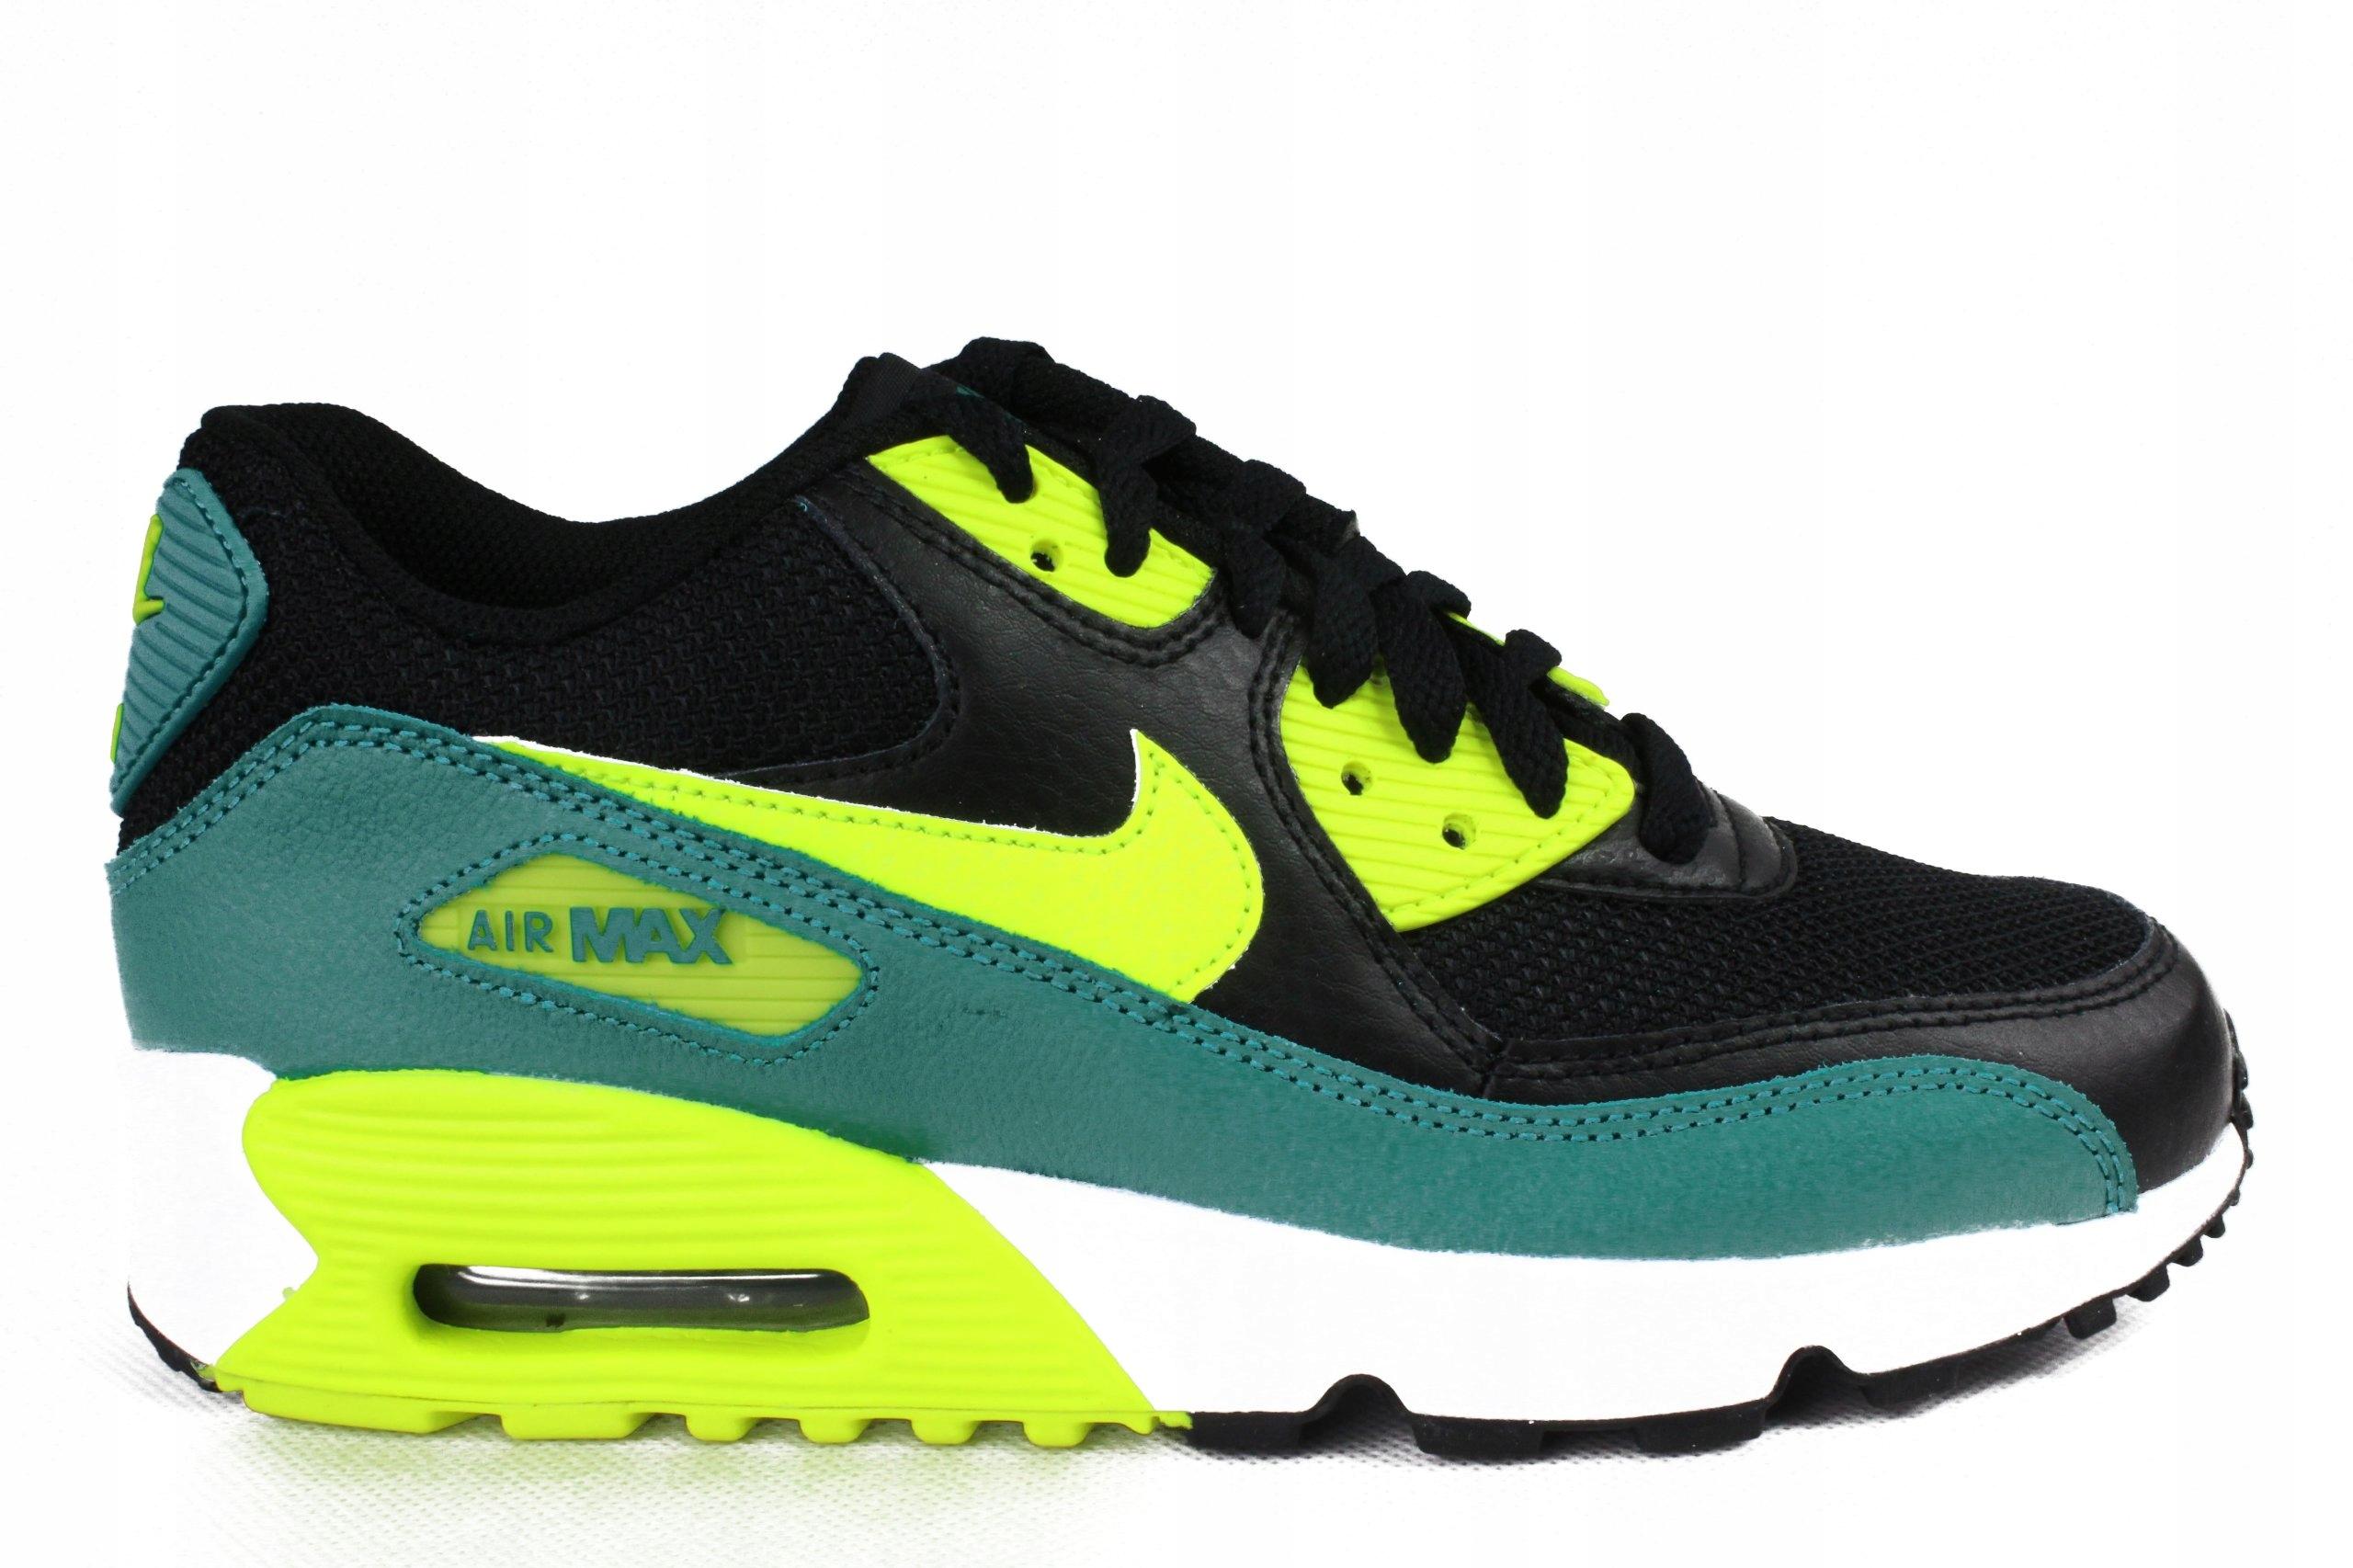 Buty damskie Nike Air Max 90 833418 001 38.5 Ceny i opinie